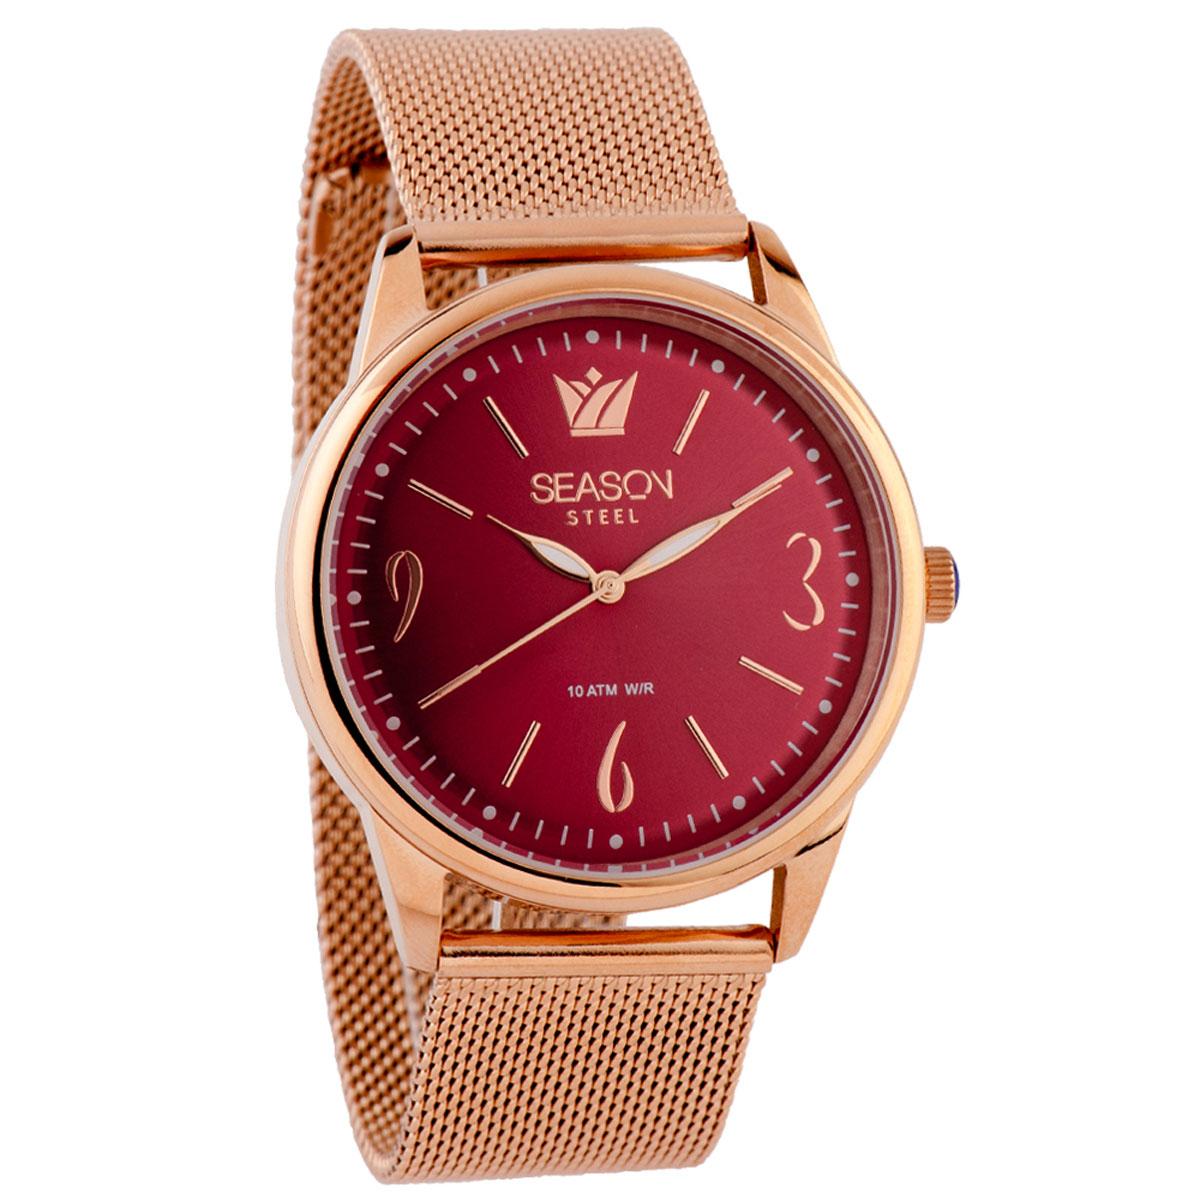 Season Time ατσάλινο γυναικείο ρολόι 6-4-4-8 της σειράς Minimal Steel με  ροζ χρυσό μπρασελέ 330d32dbfc5